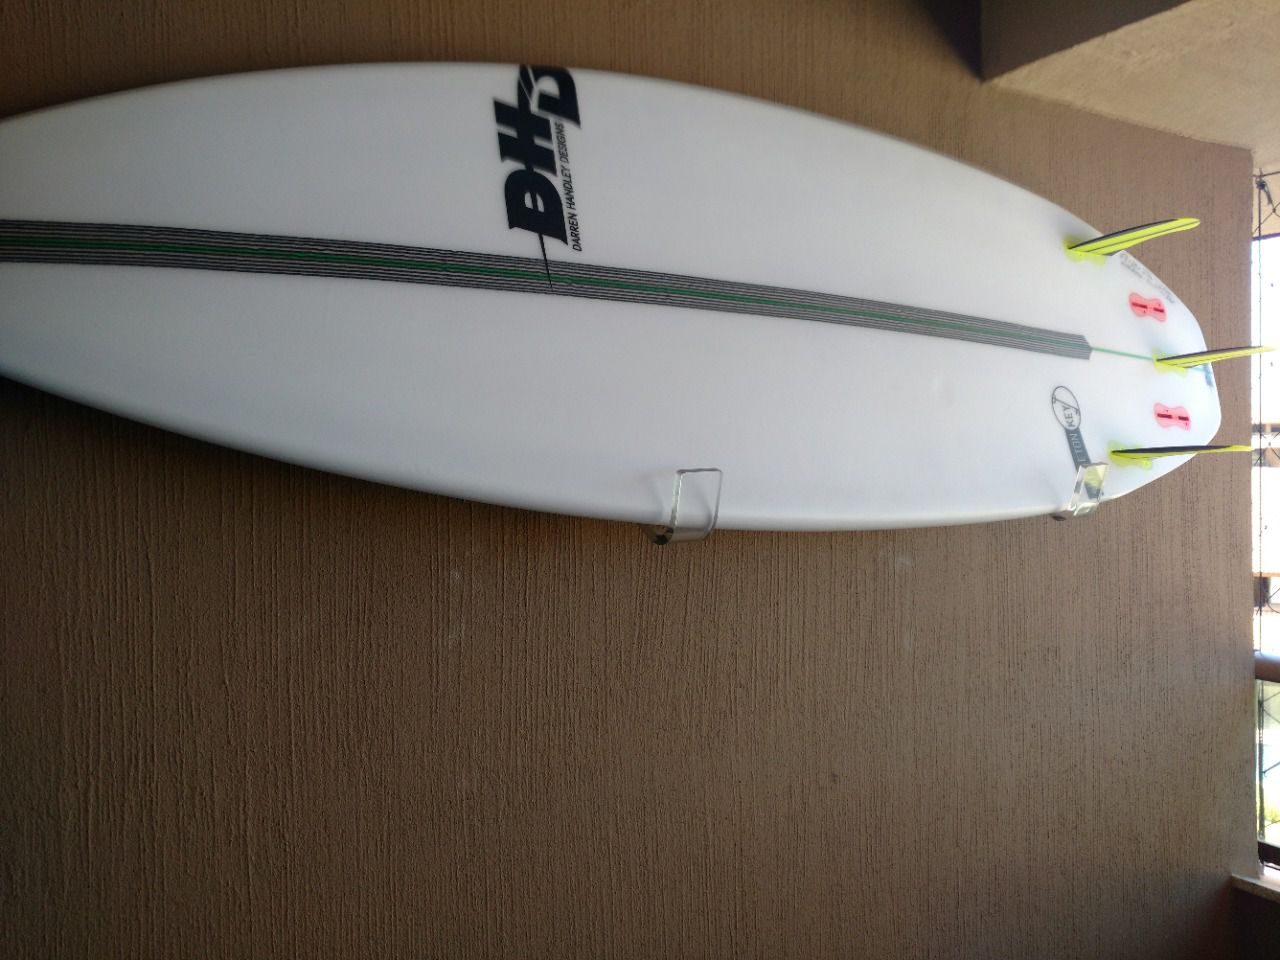 Suporte de Parede Prancha de Surf